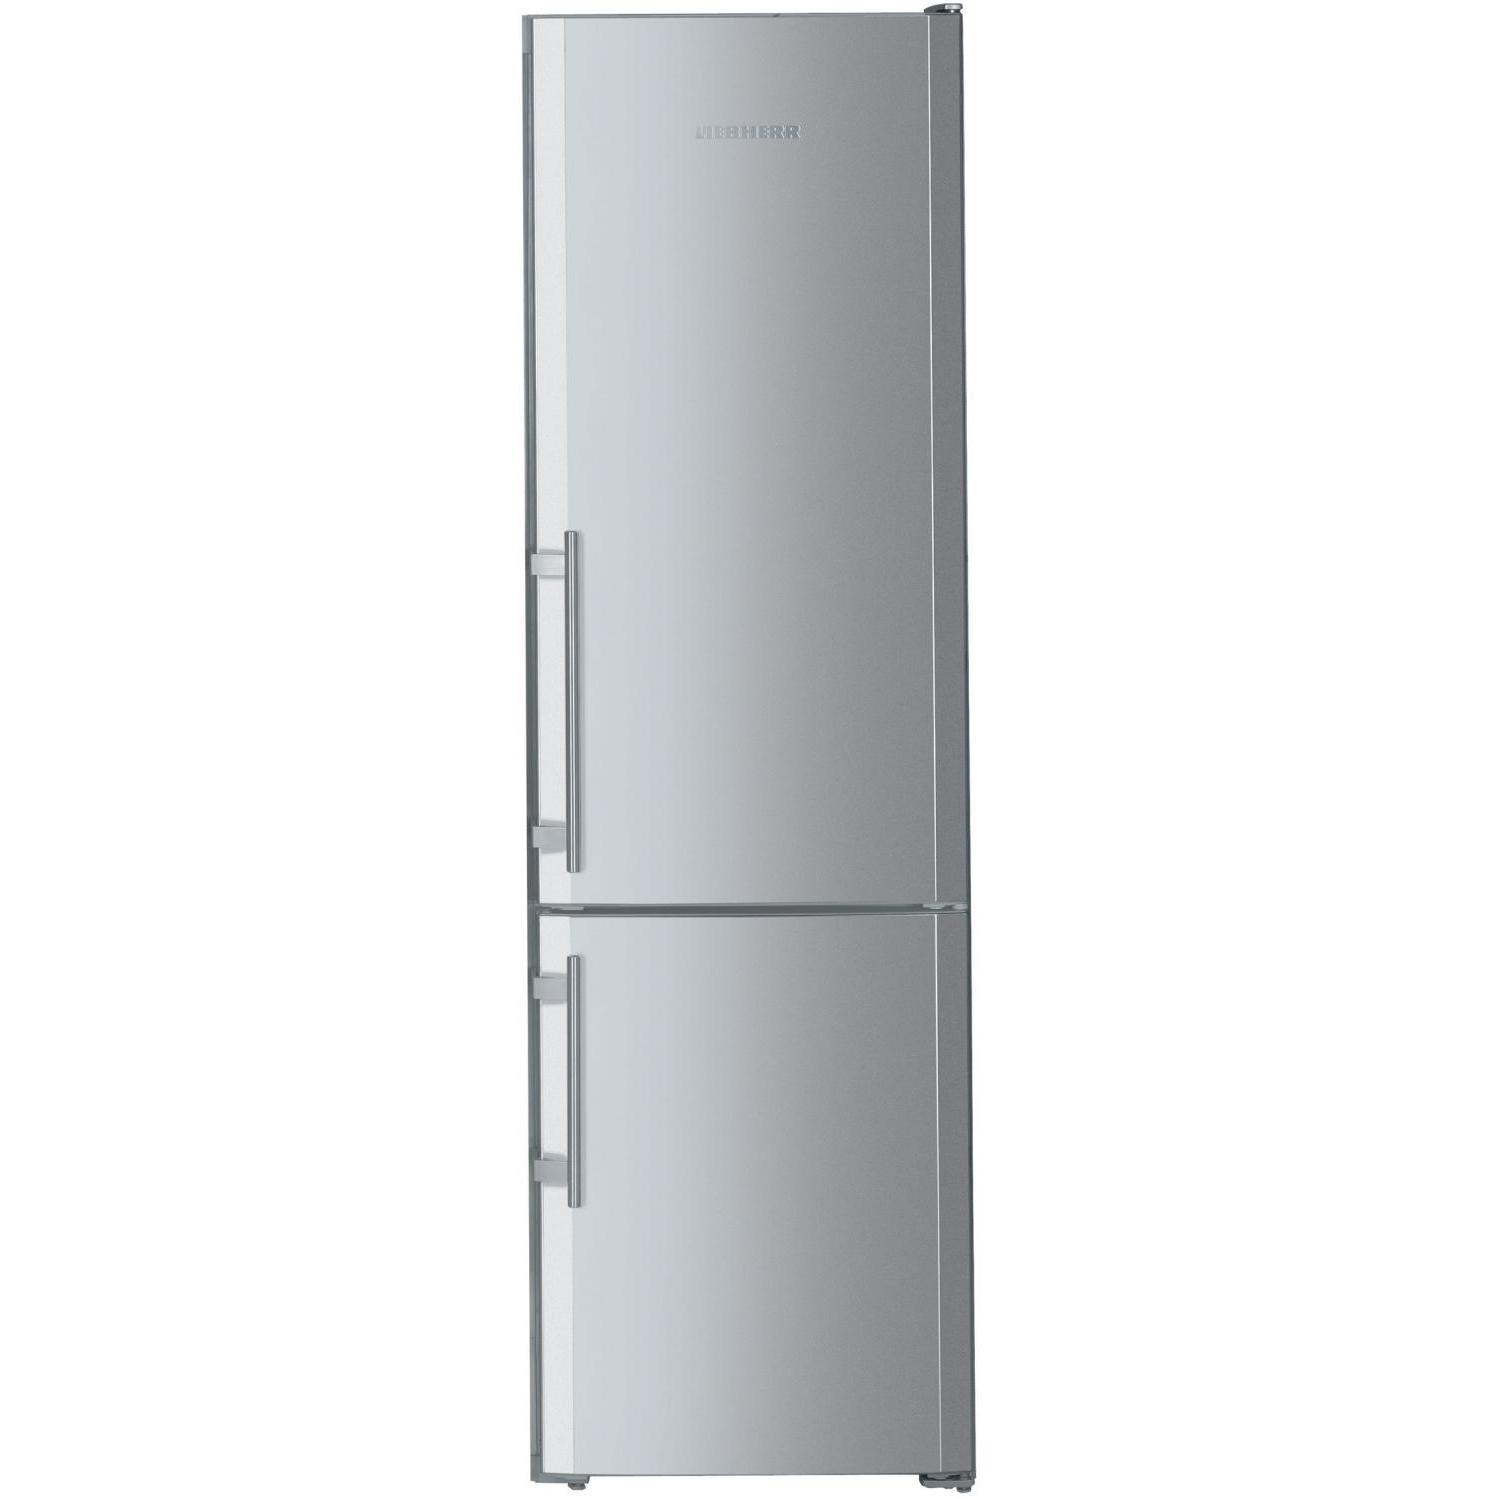 Liebherr 13.0 Cu. Ft. Bottom Freezer Refrigerator With Ice Maker - Stainless Steel - CS-1360 2682598